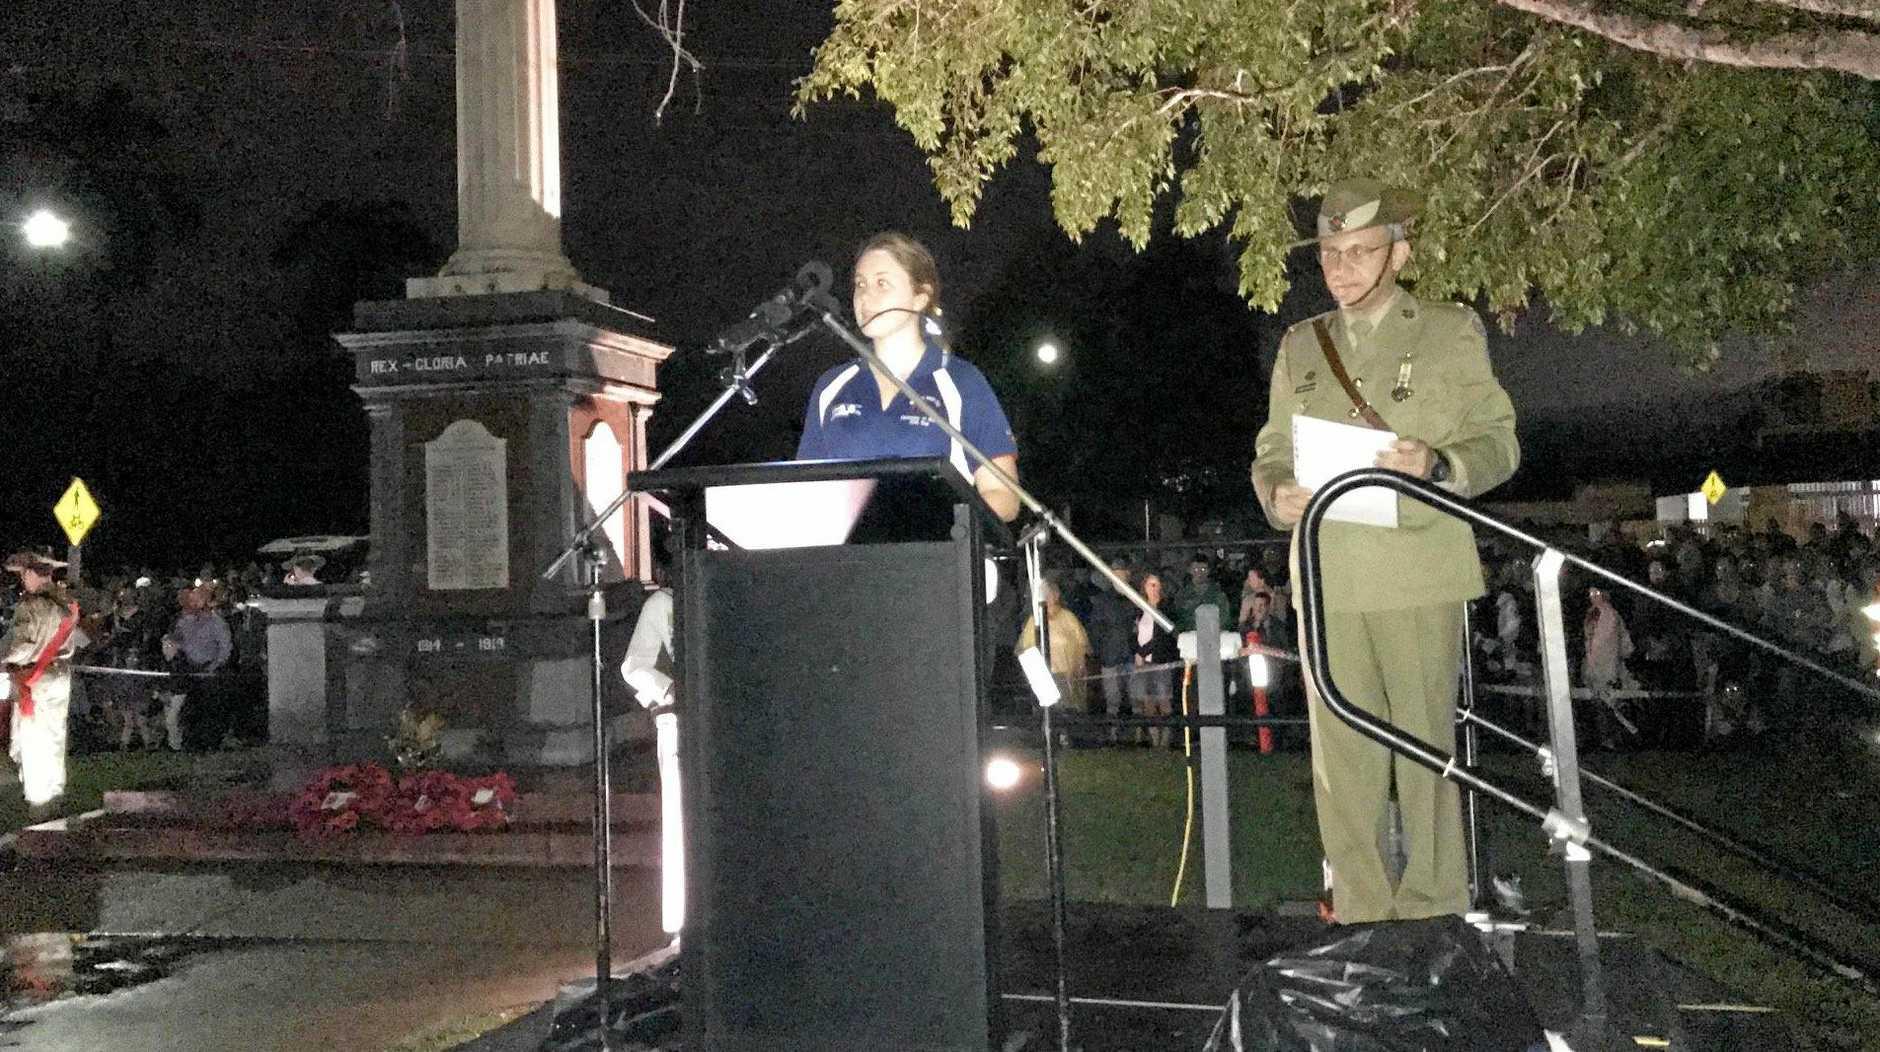 Emma Cameron speaks at the Mackay Dawn Service